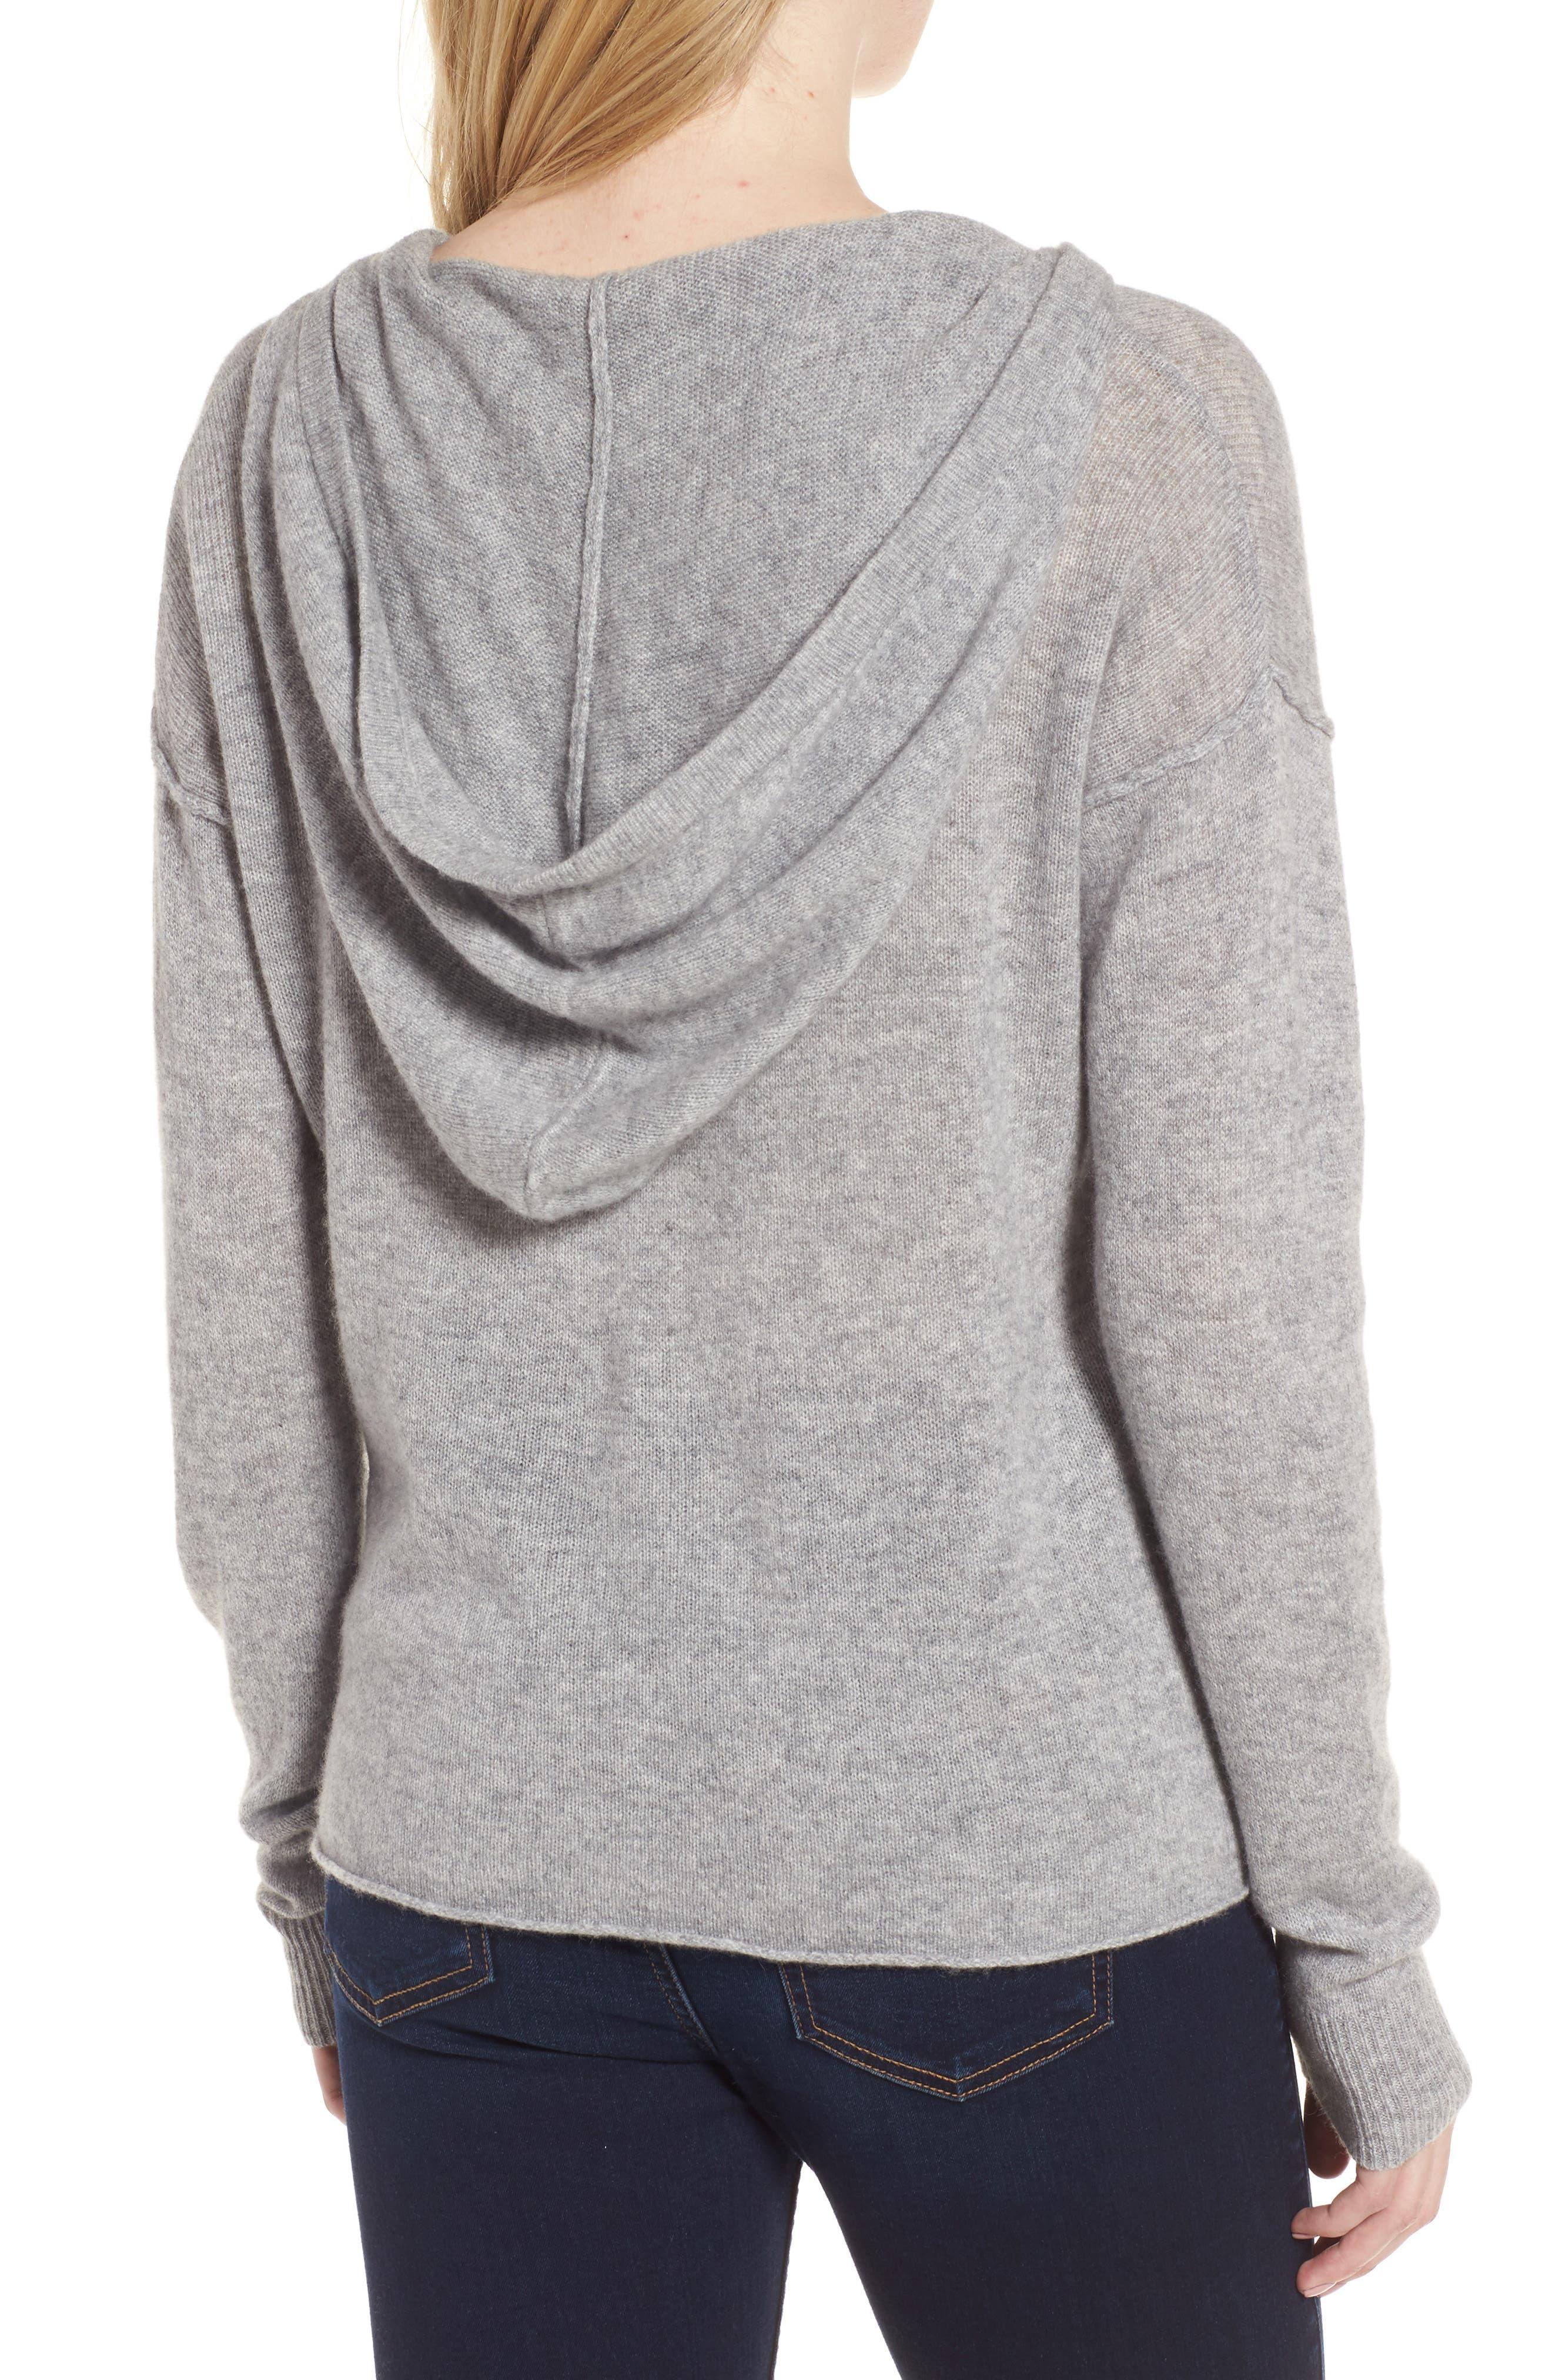 Dakota Cashmere Hooded Sweater,                             Alternate thumbnail 2, color,                             Heather Grey